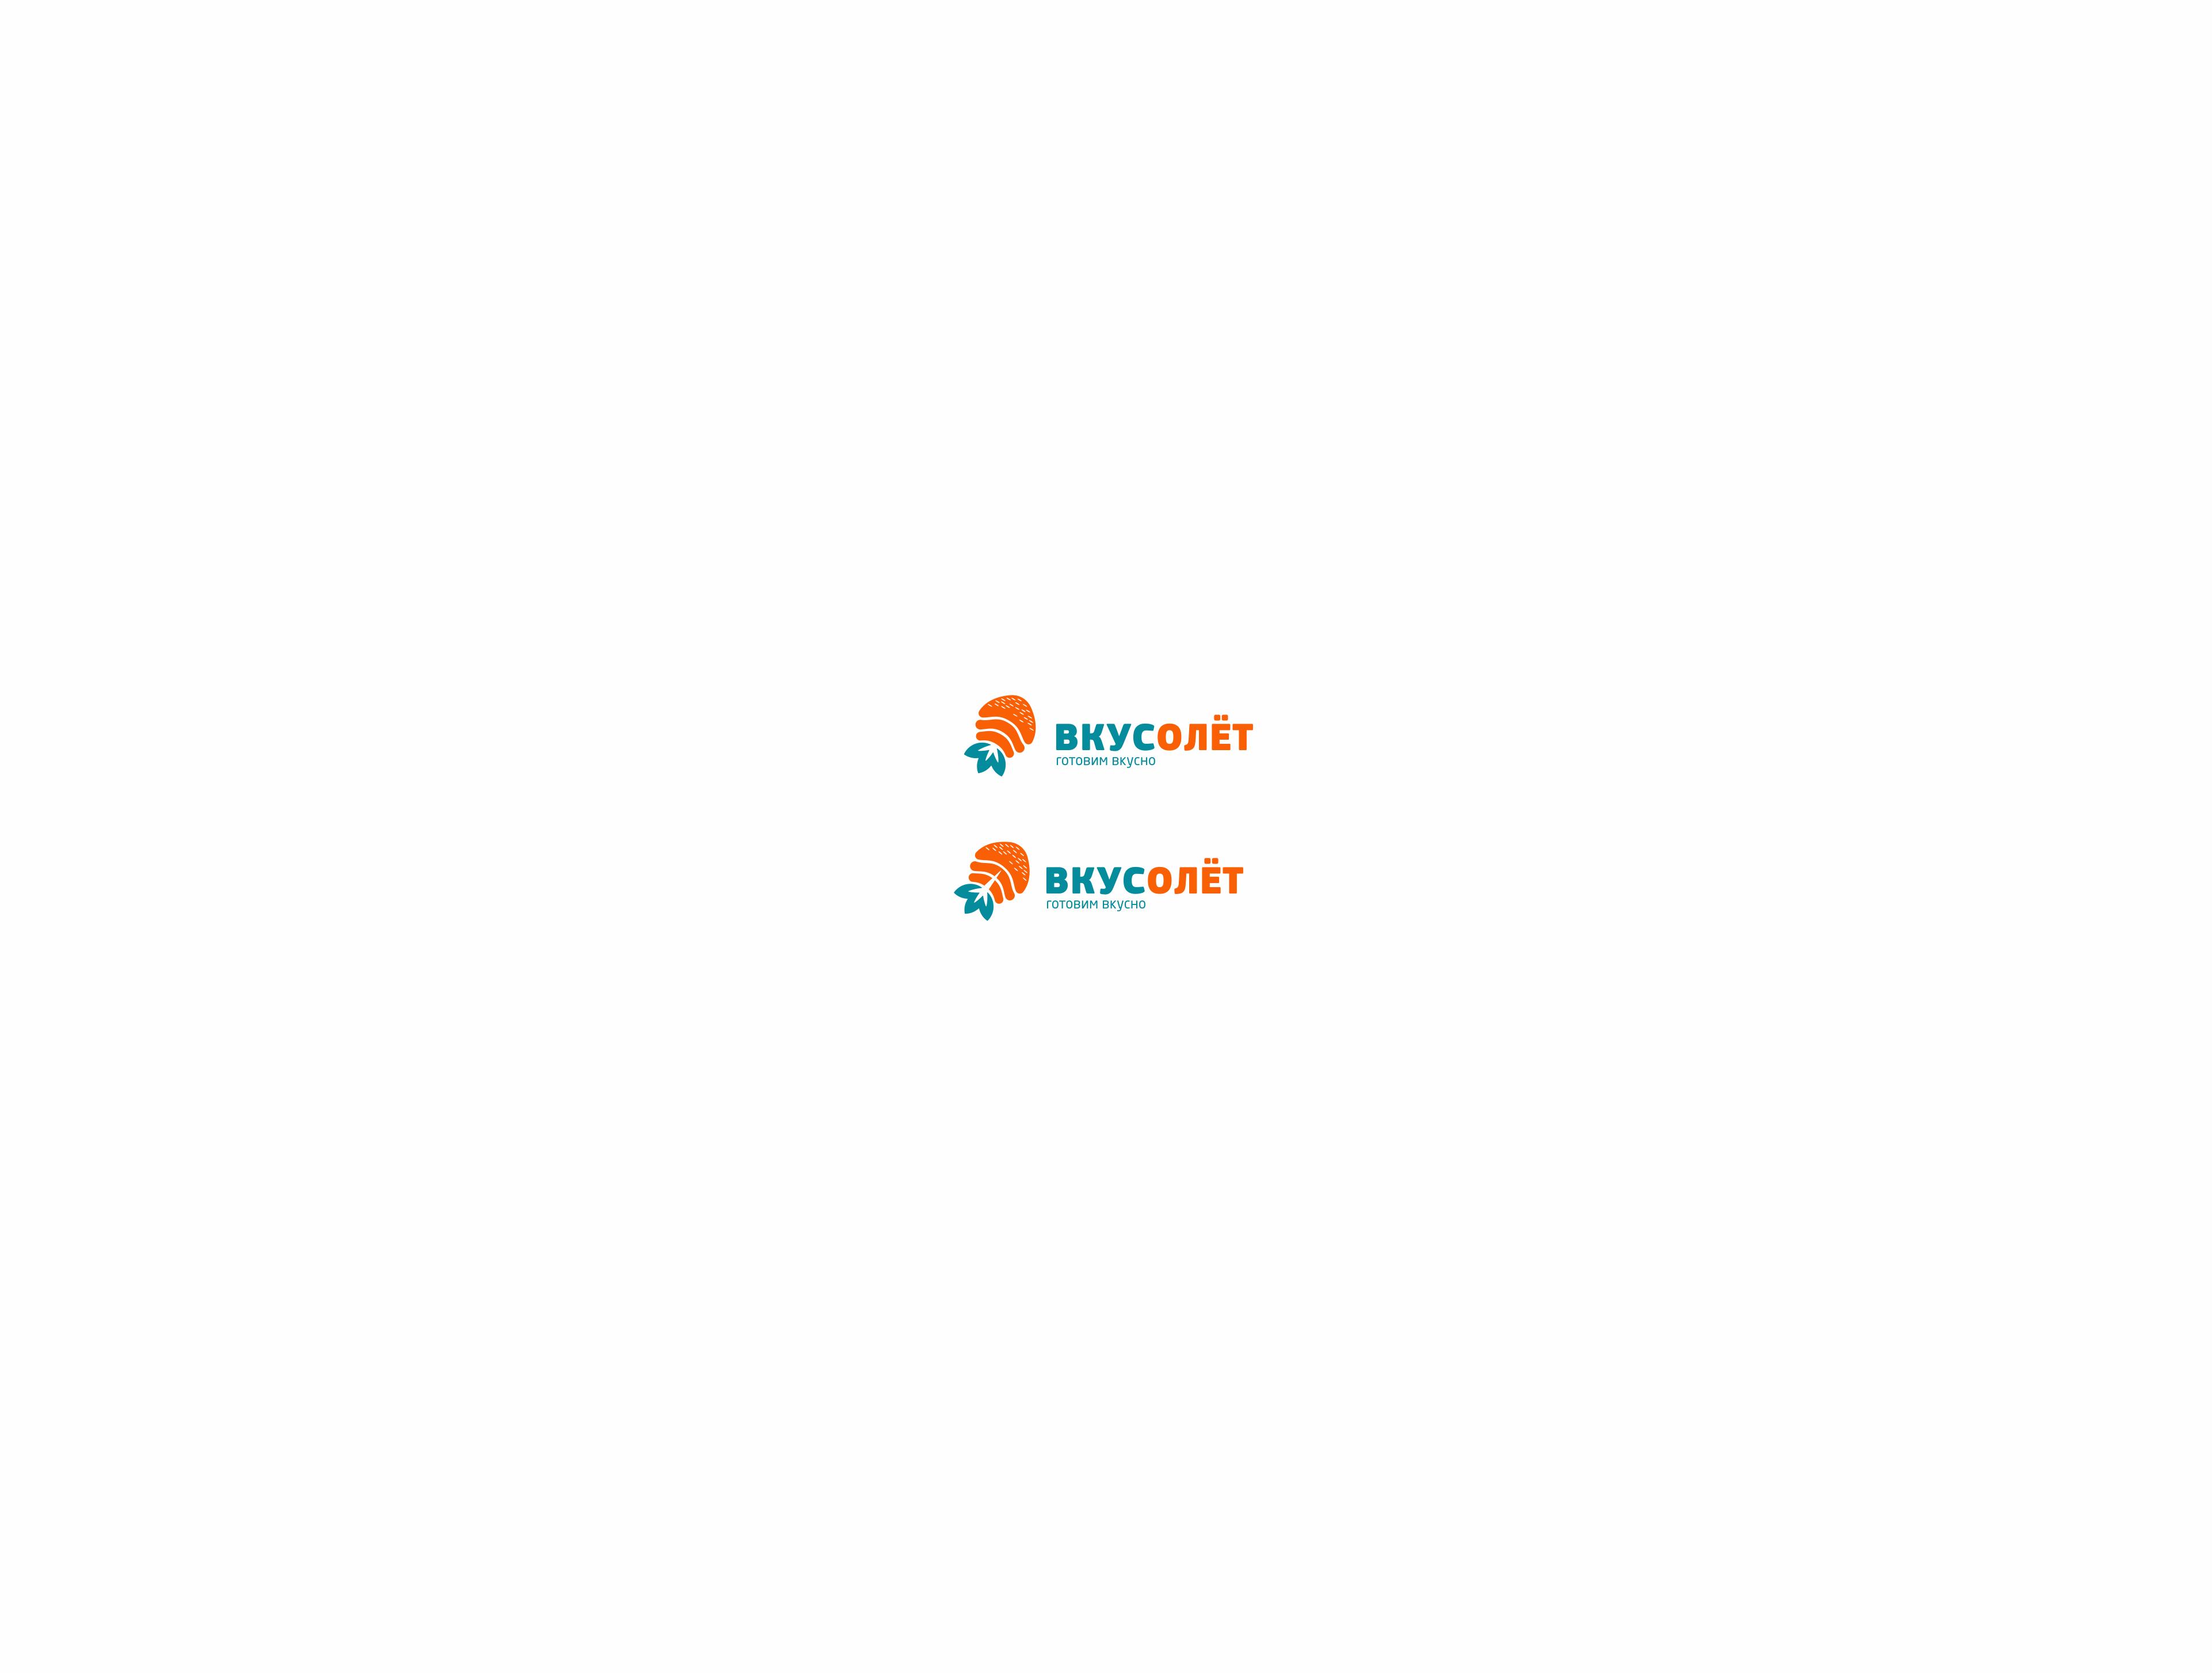 Логотип для доставки еды фото f_65959dd15454604b.png